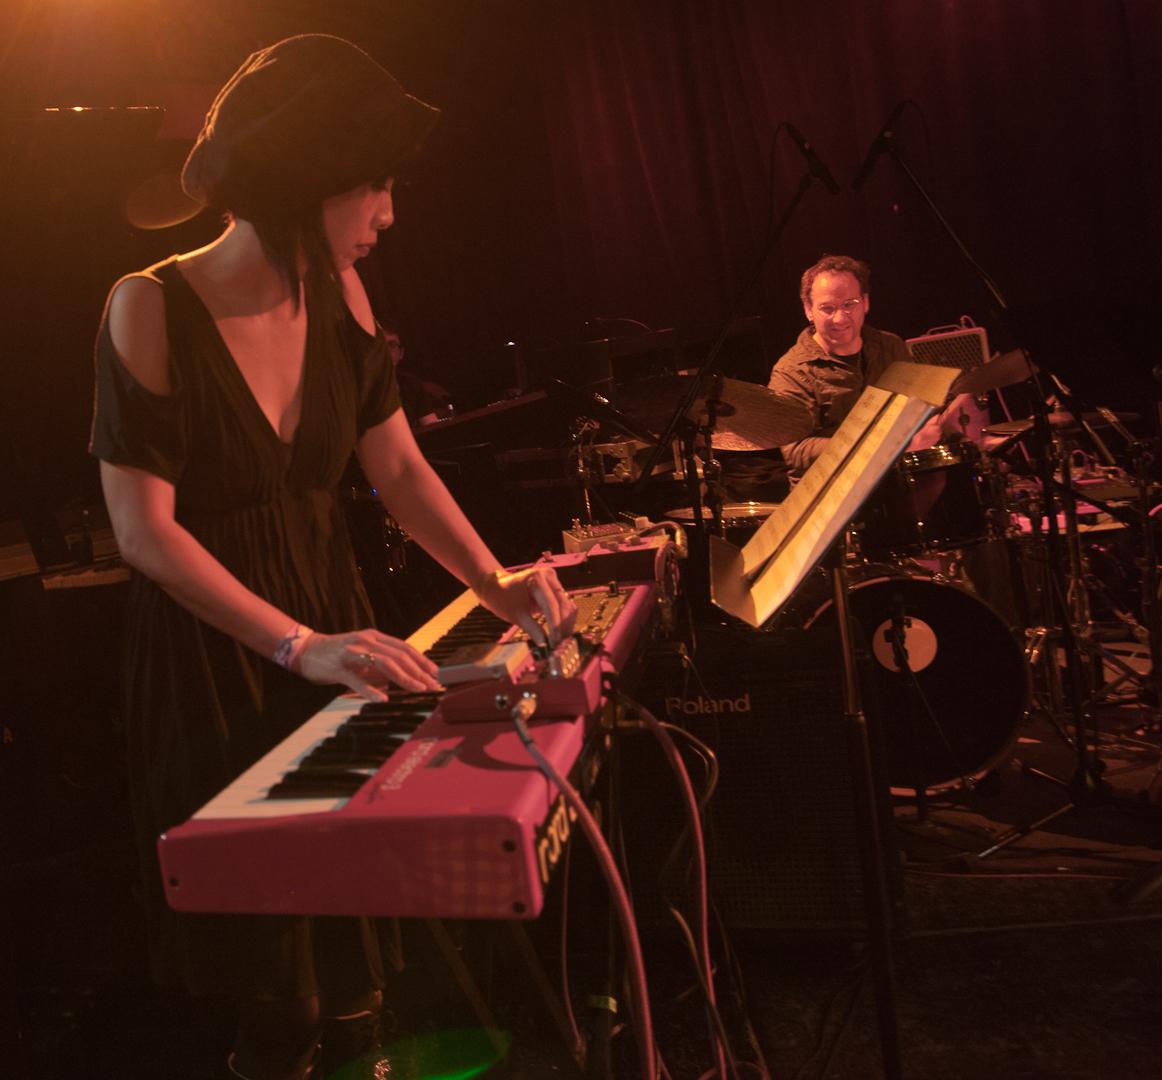 Yuka Honda and Scott Amendola with the Nels Cline Singers at the Winter Jazzfest 2012